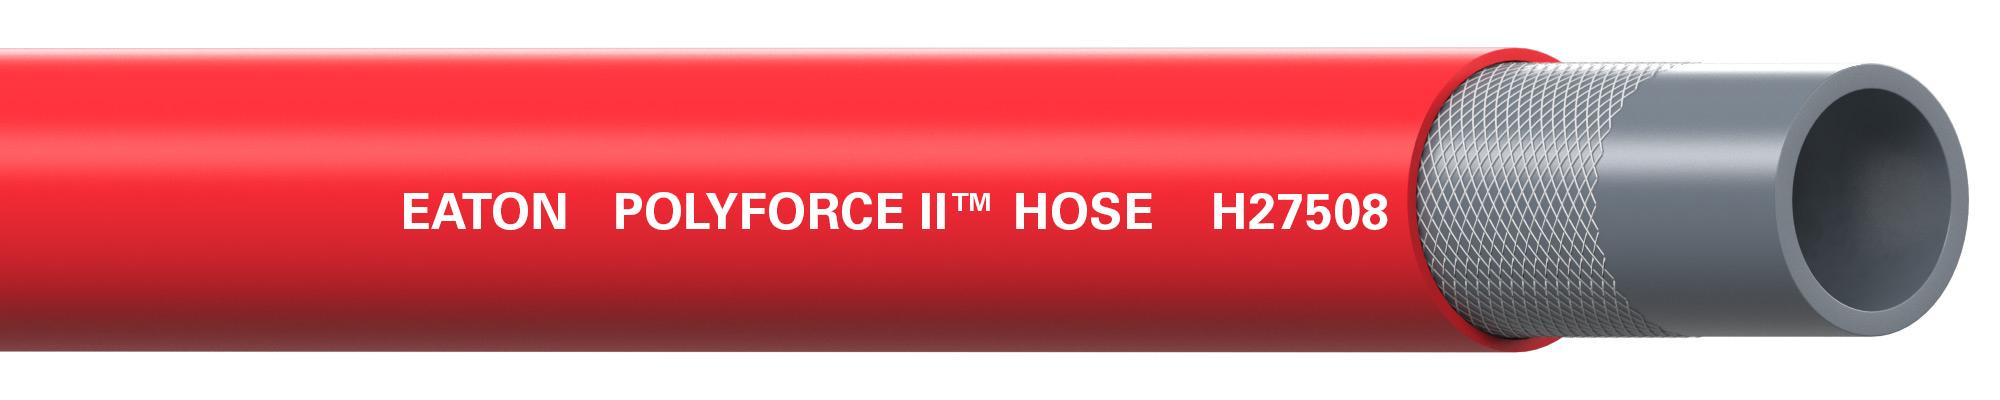 Thermoplastic Hose